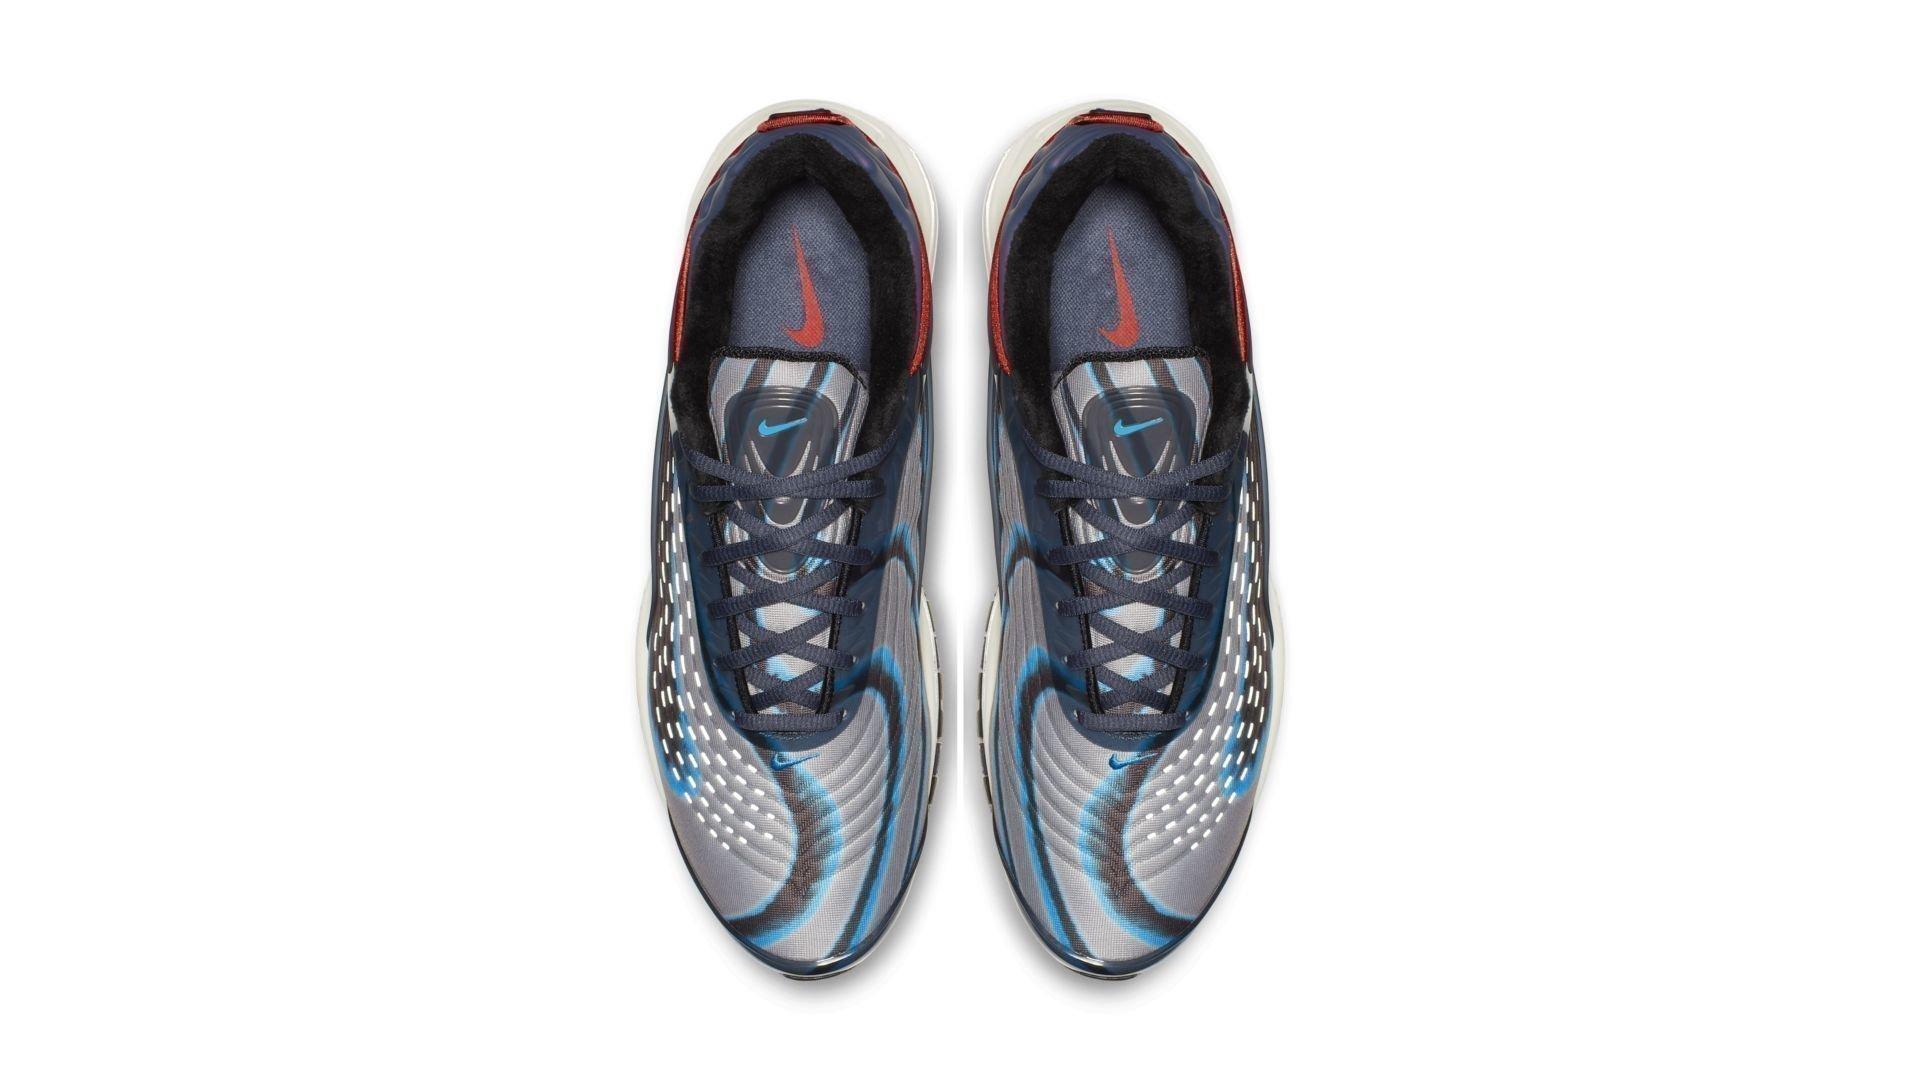 Nike Air Max Deluxe 'Thunder Blue' (AJ7831-402)